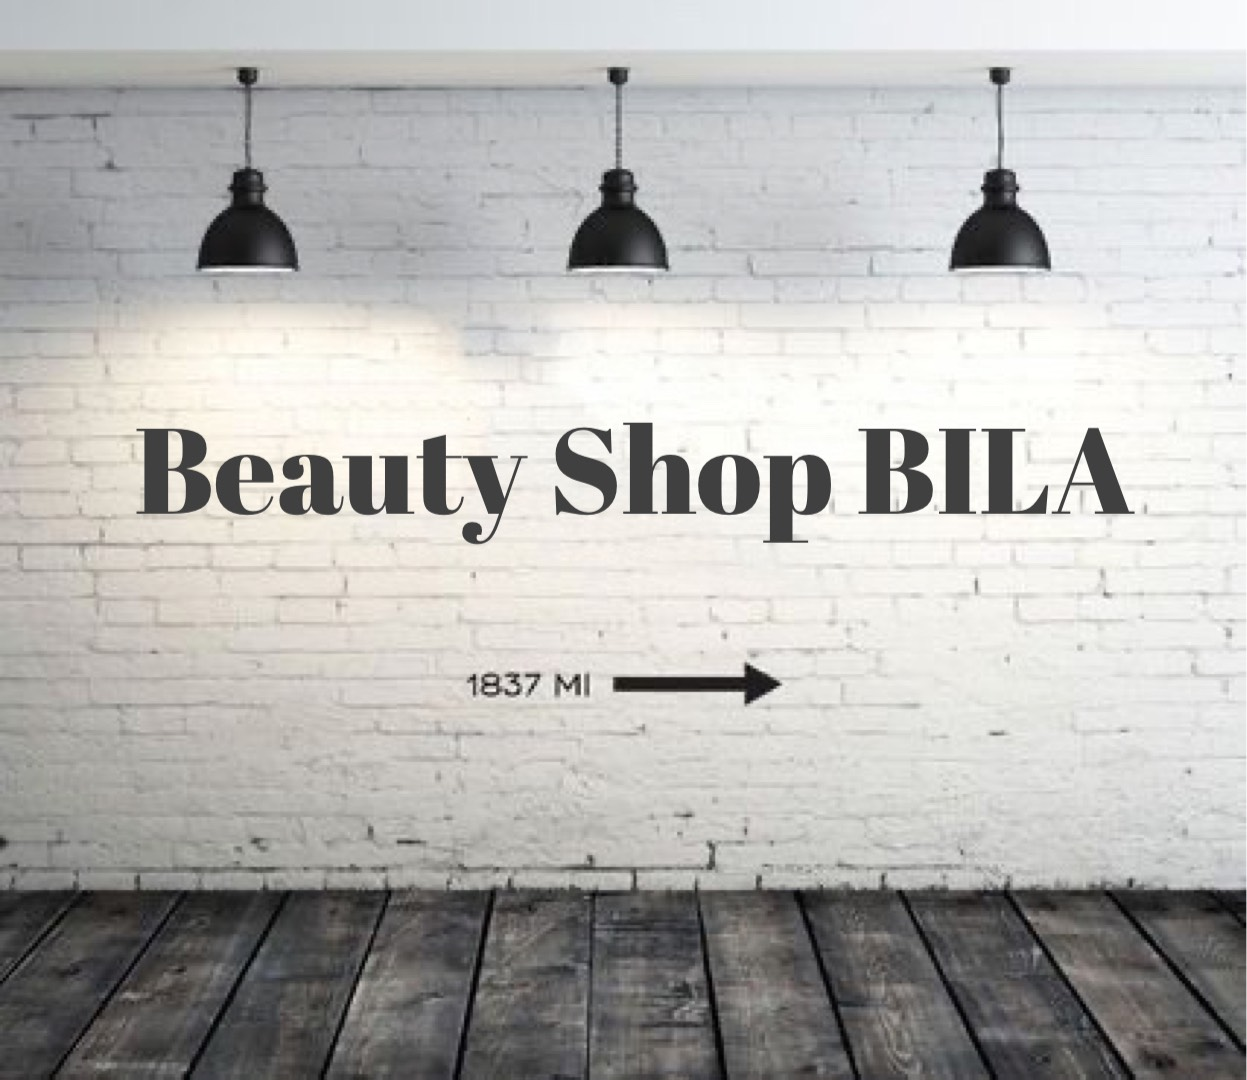 Beauty Shop BILA